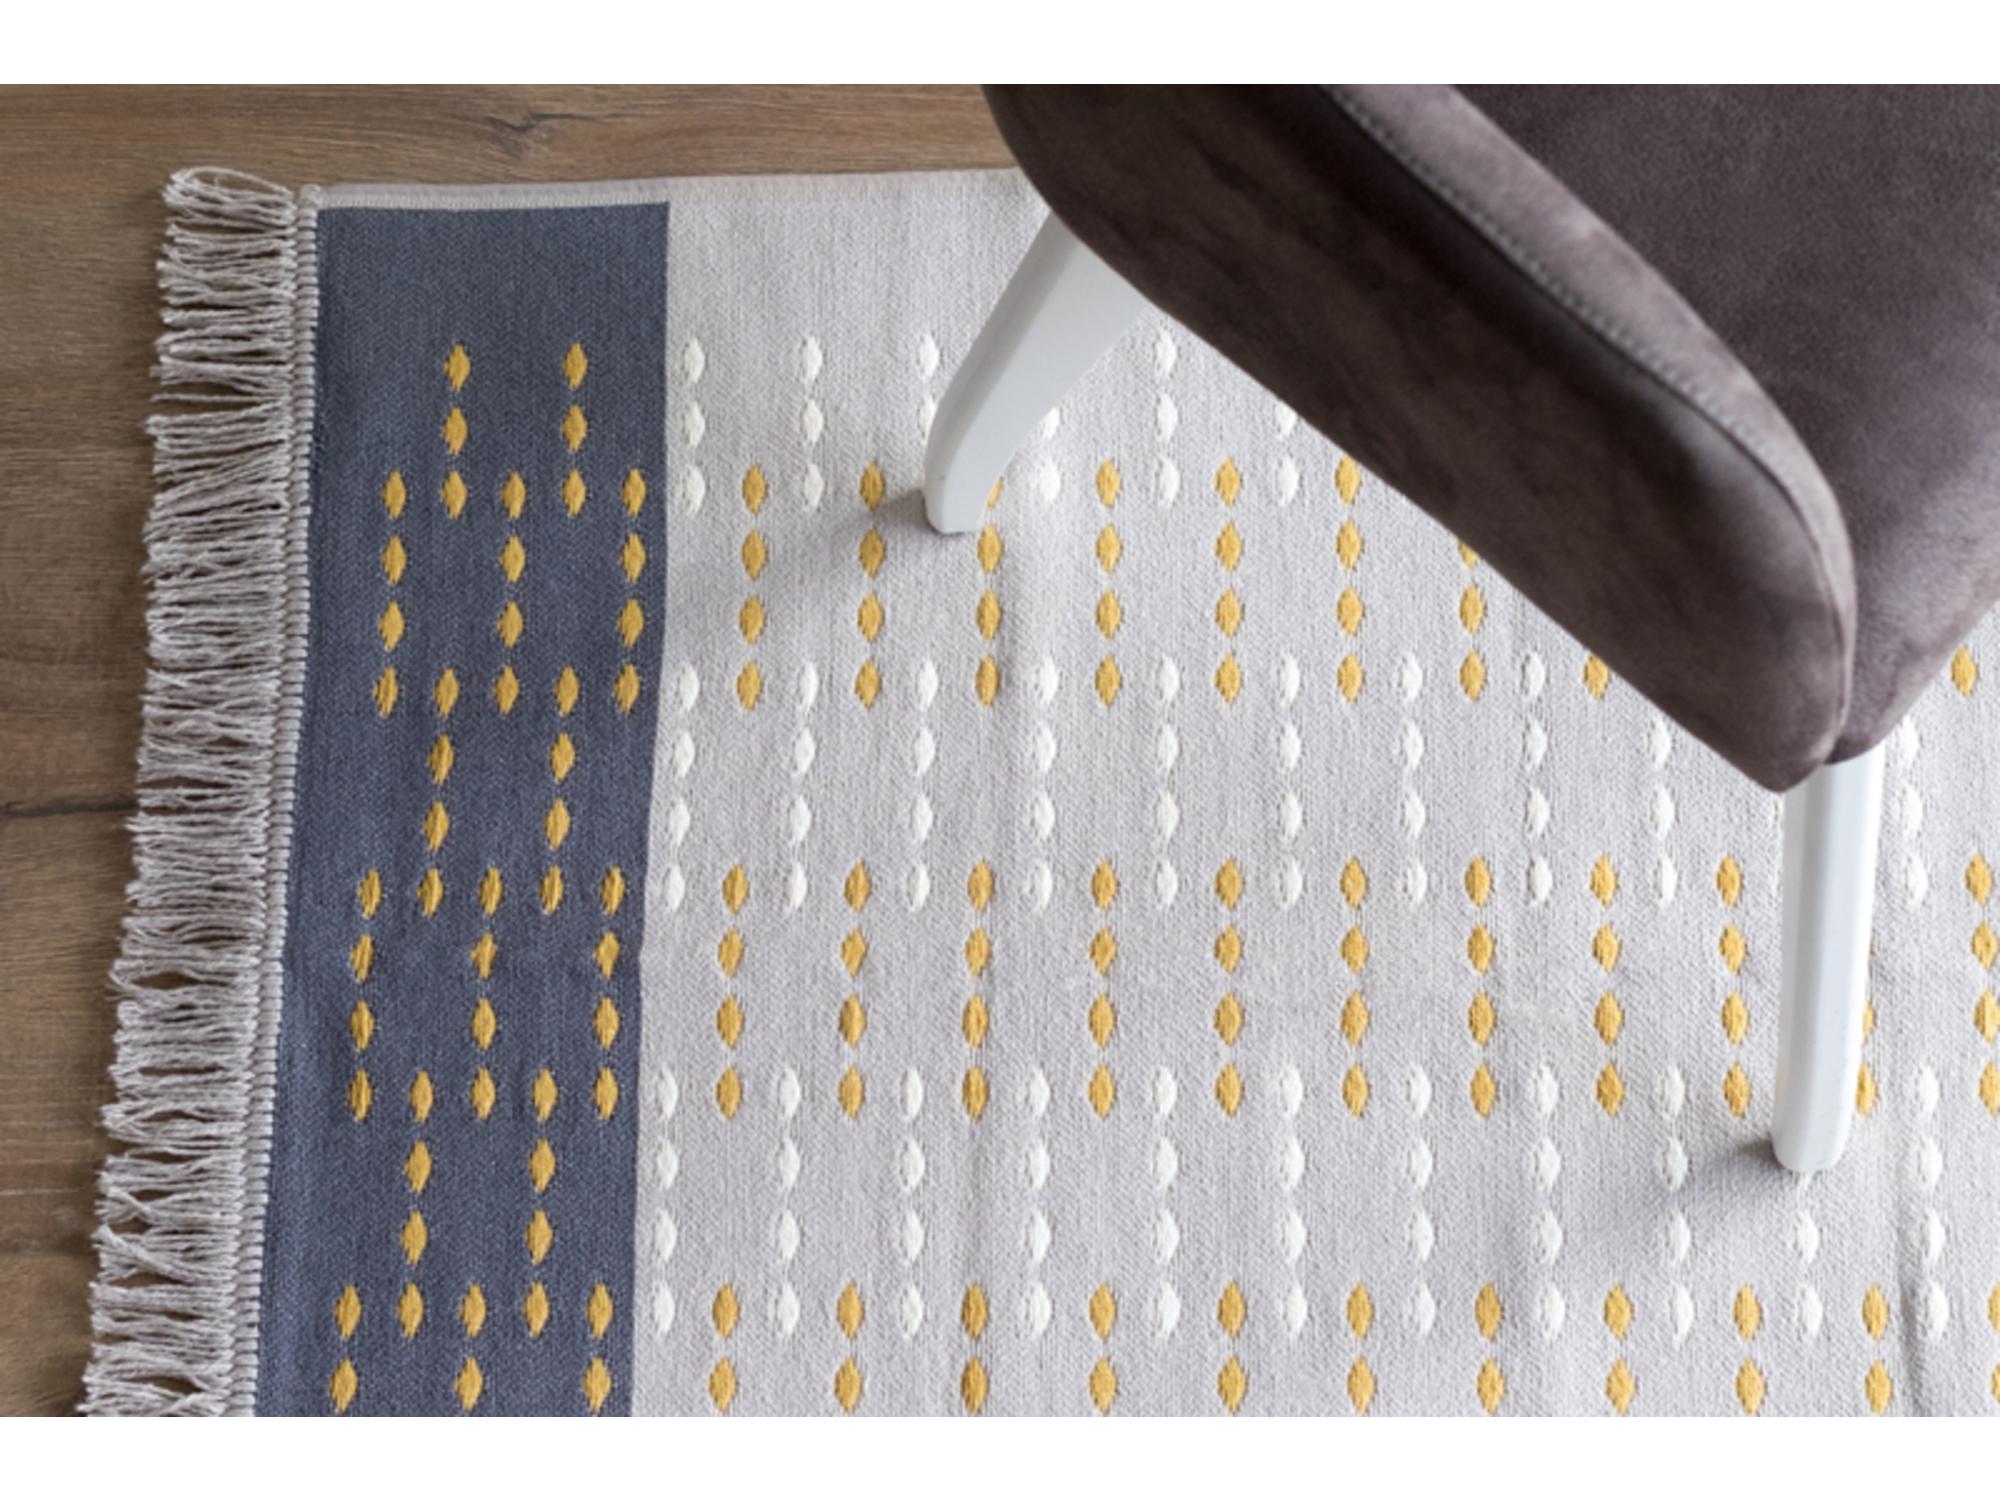 DekorDom Tepih Stella 160x250cm - Sp-Klm 163 B - Beige Mustard